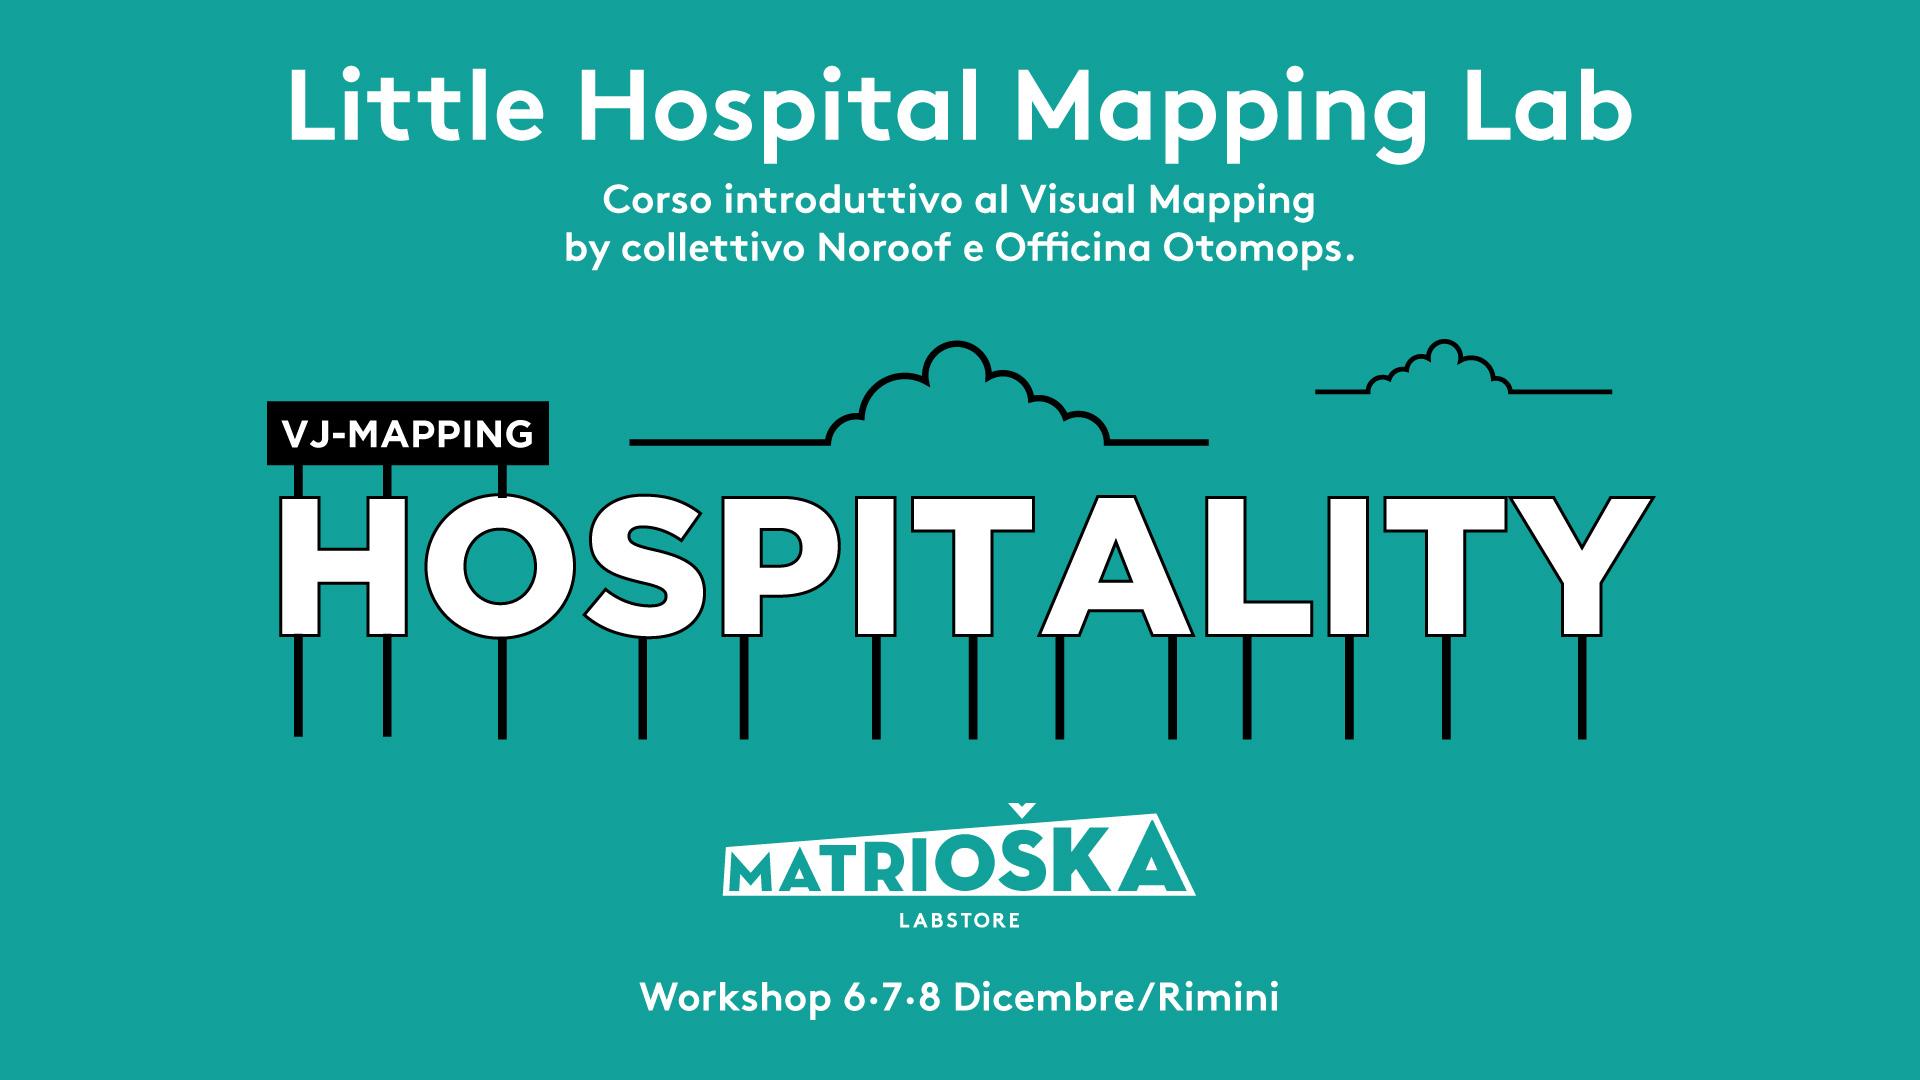 Matrioska_6_ws03_LittleHospital_workshop_vj_e_mapping